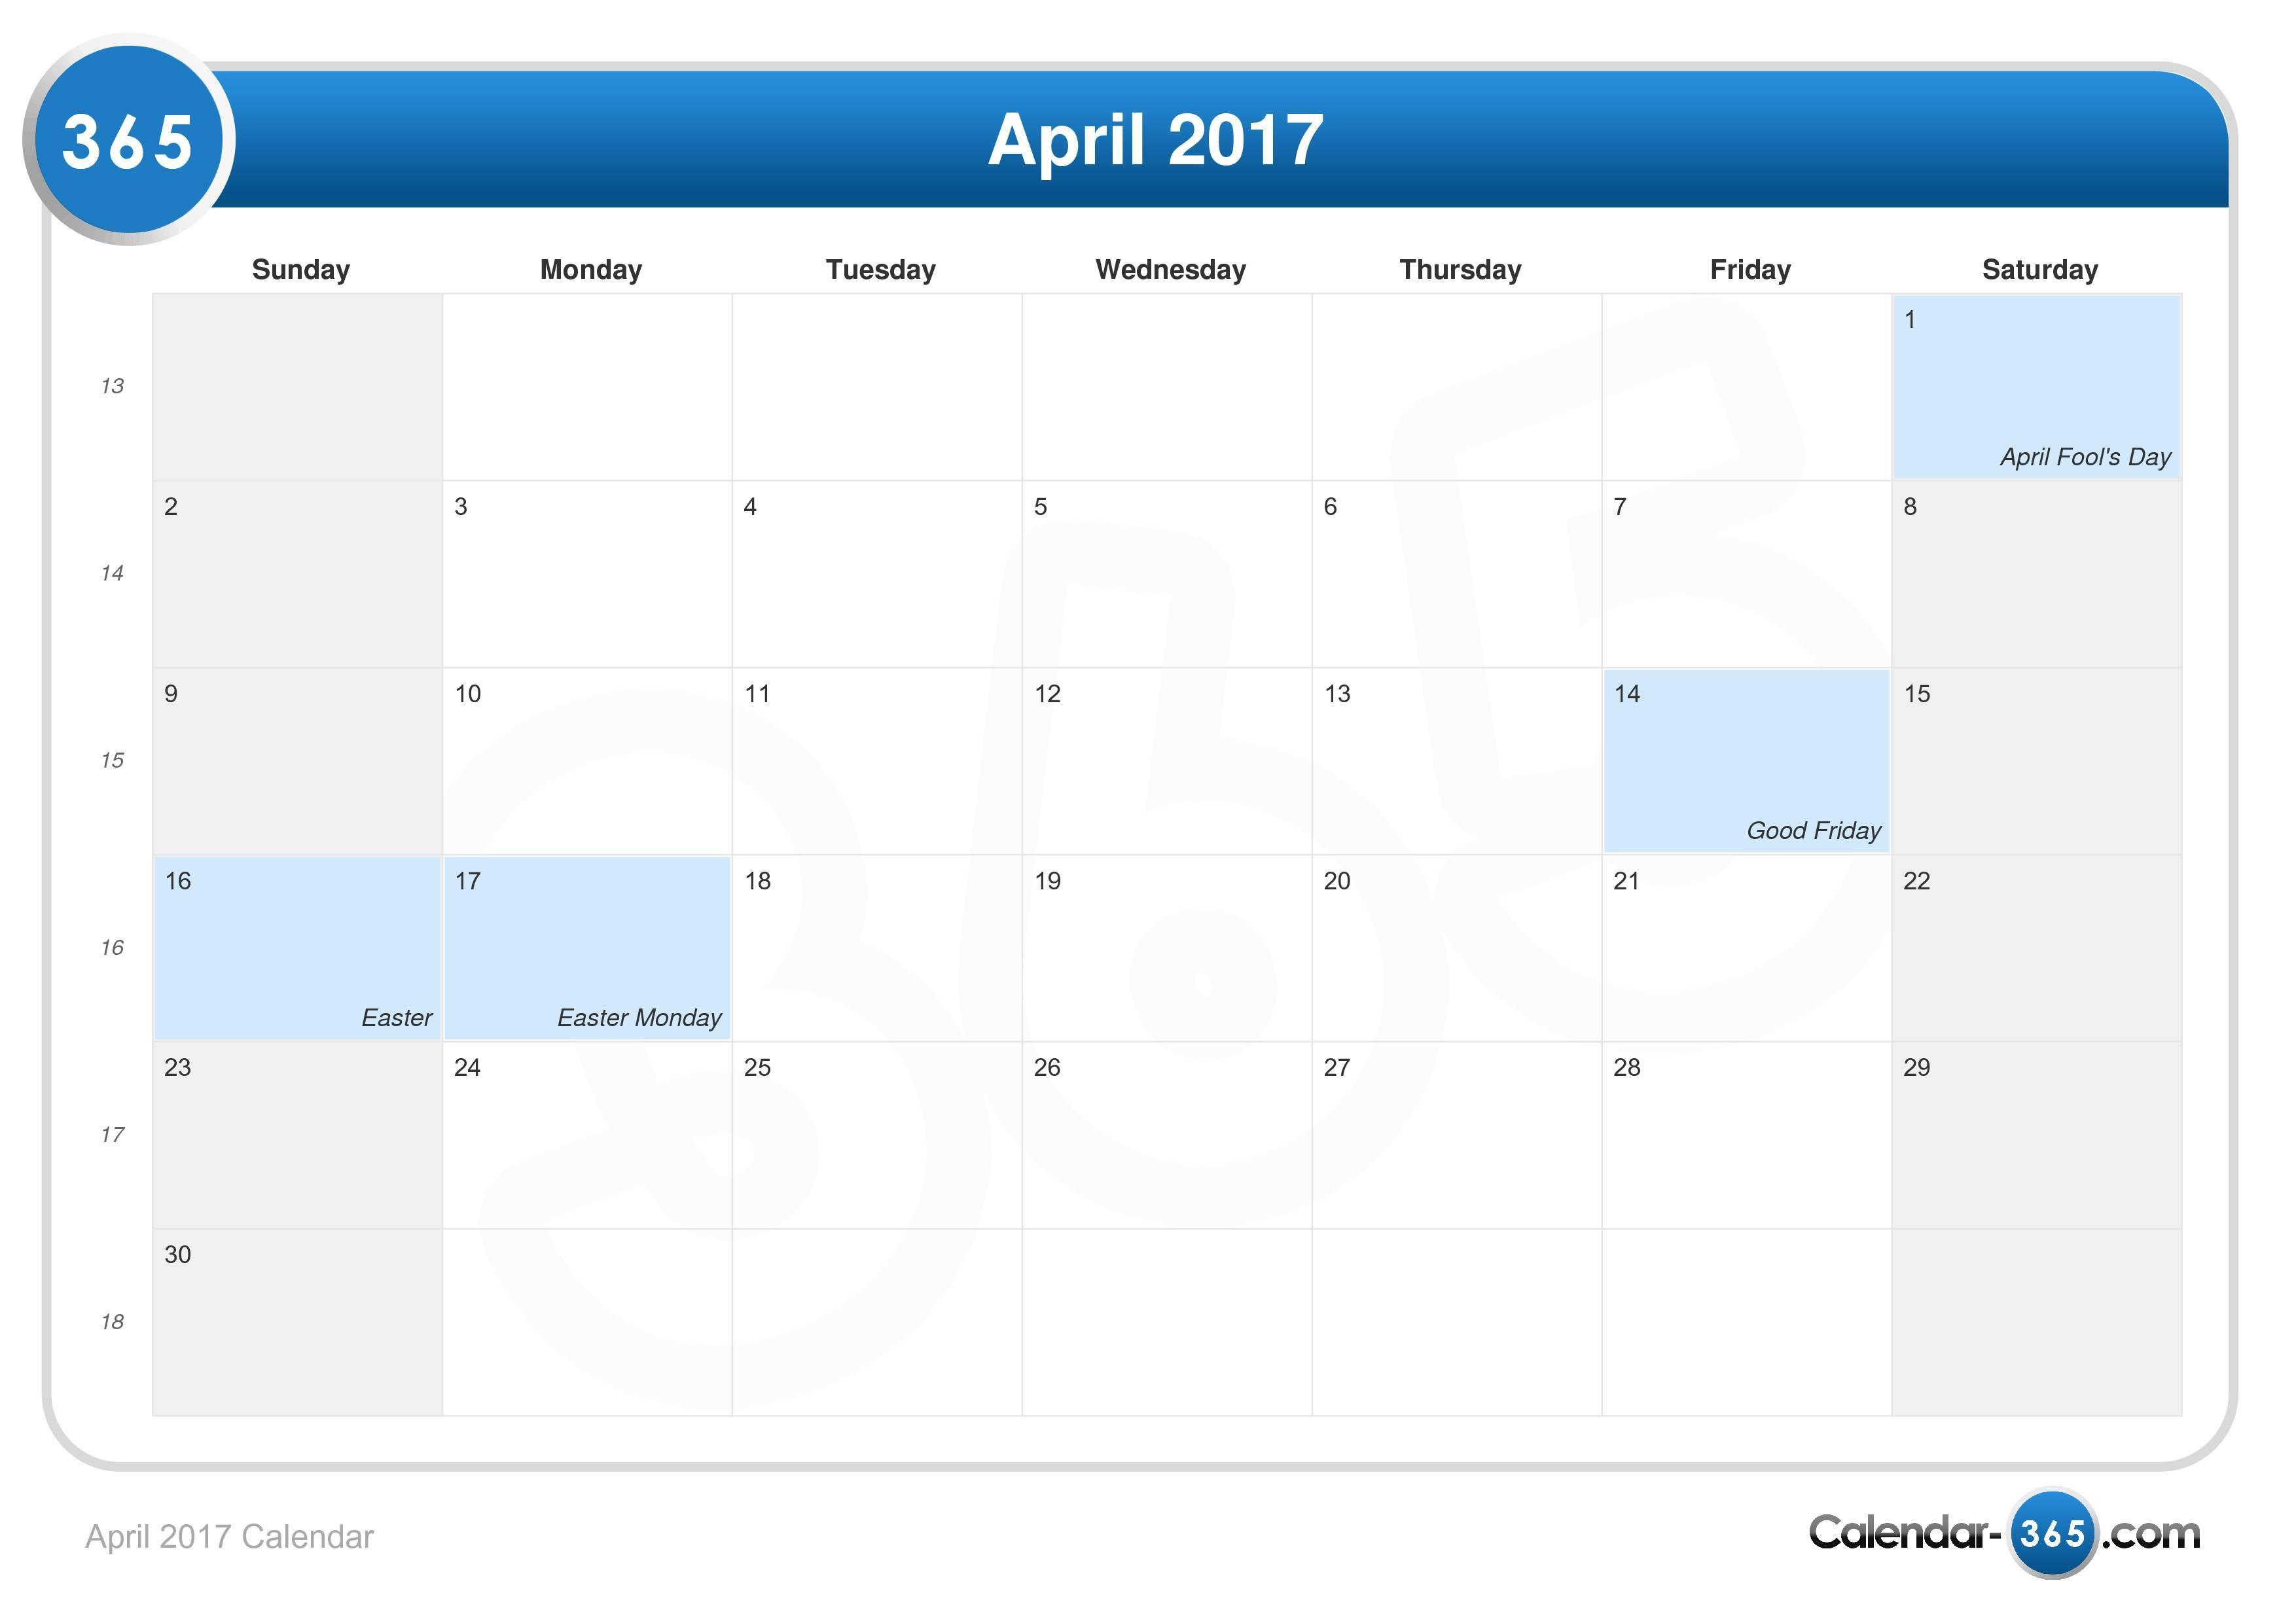 Easter dates future in Australia